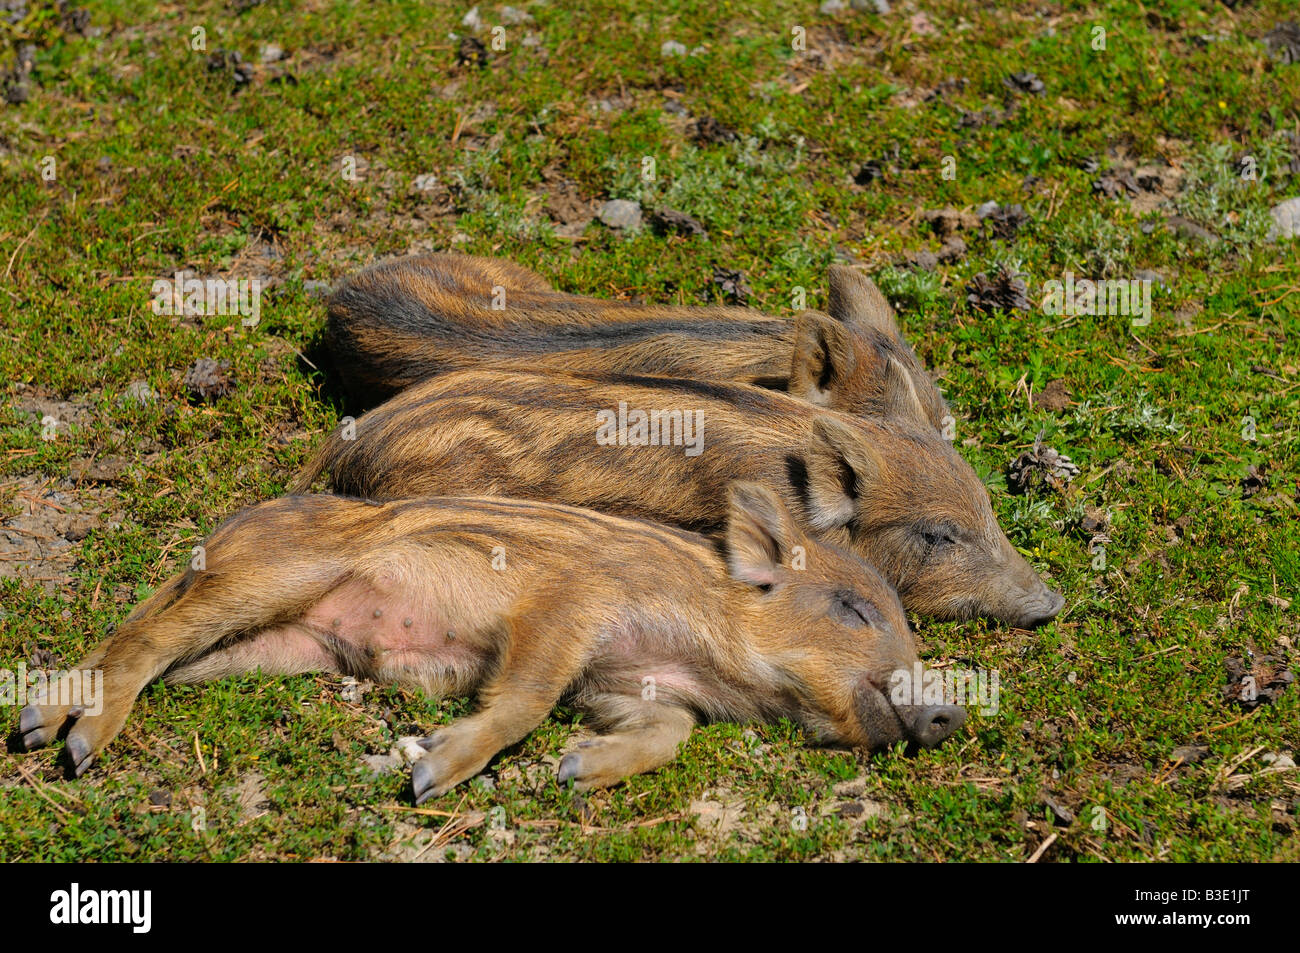 Three little baby wild boar piglets sleeping in the sun - Stock Image